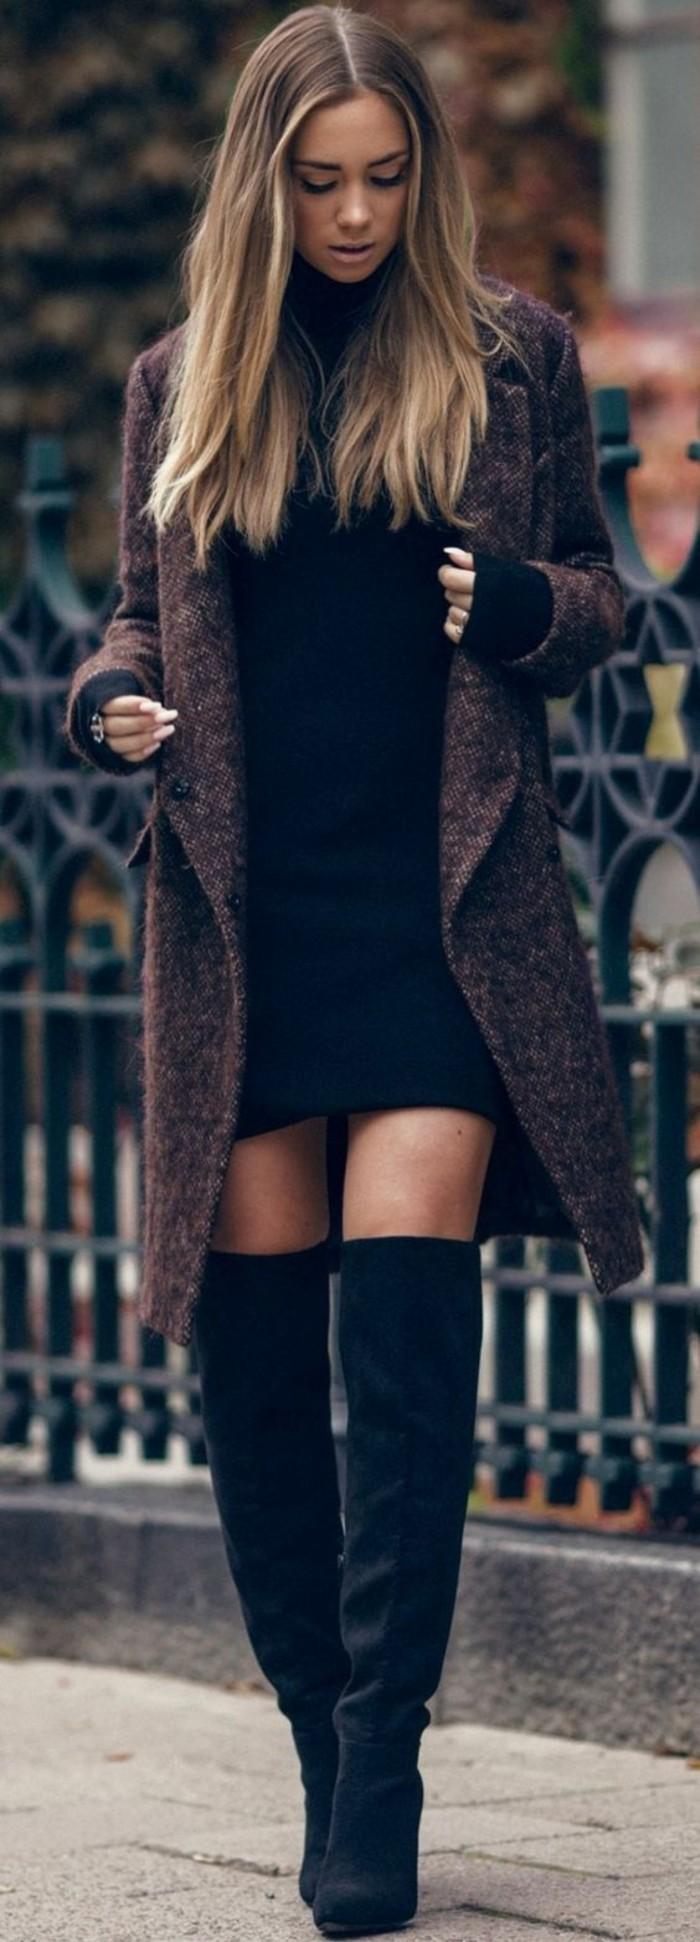 bottes-cavalieres-en-cuir-velours-robe-noire-manteau-tweed-femme